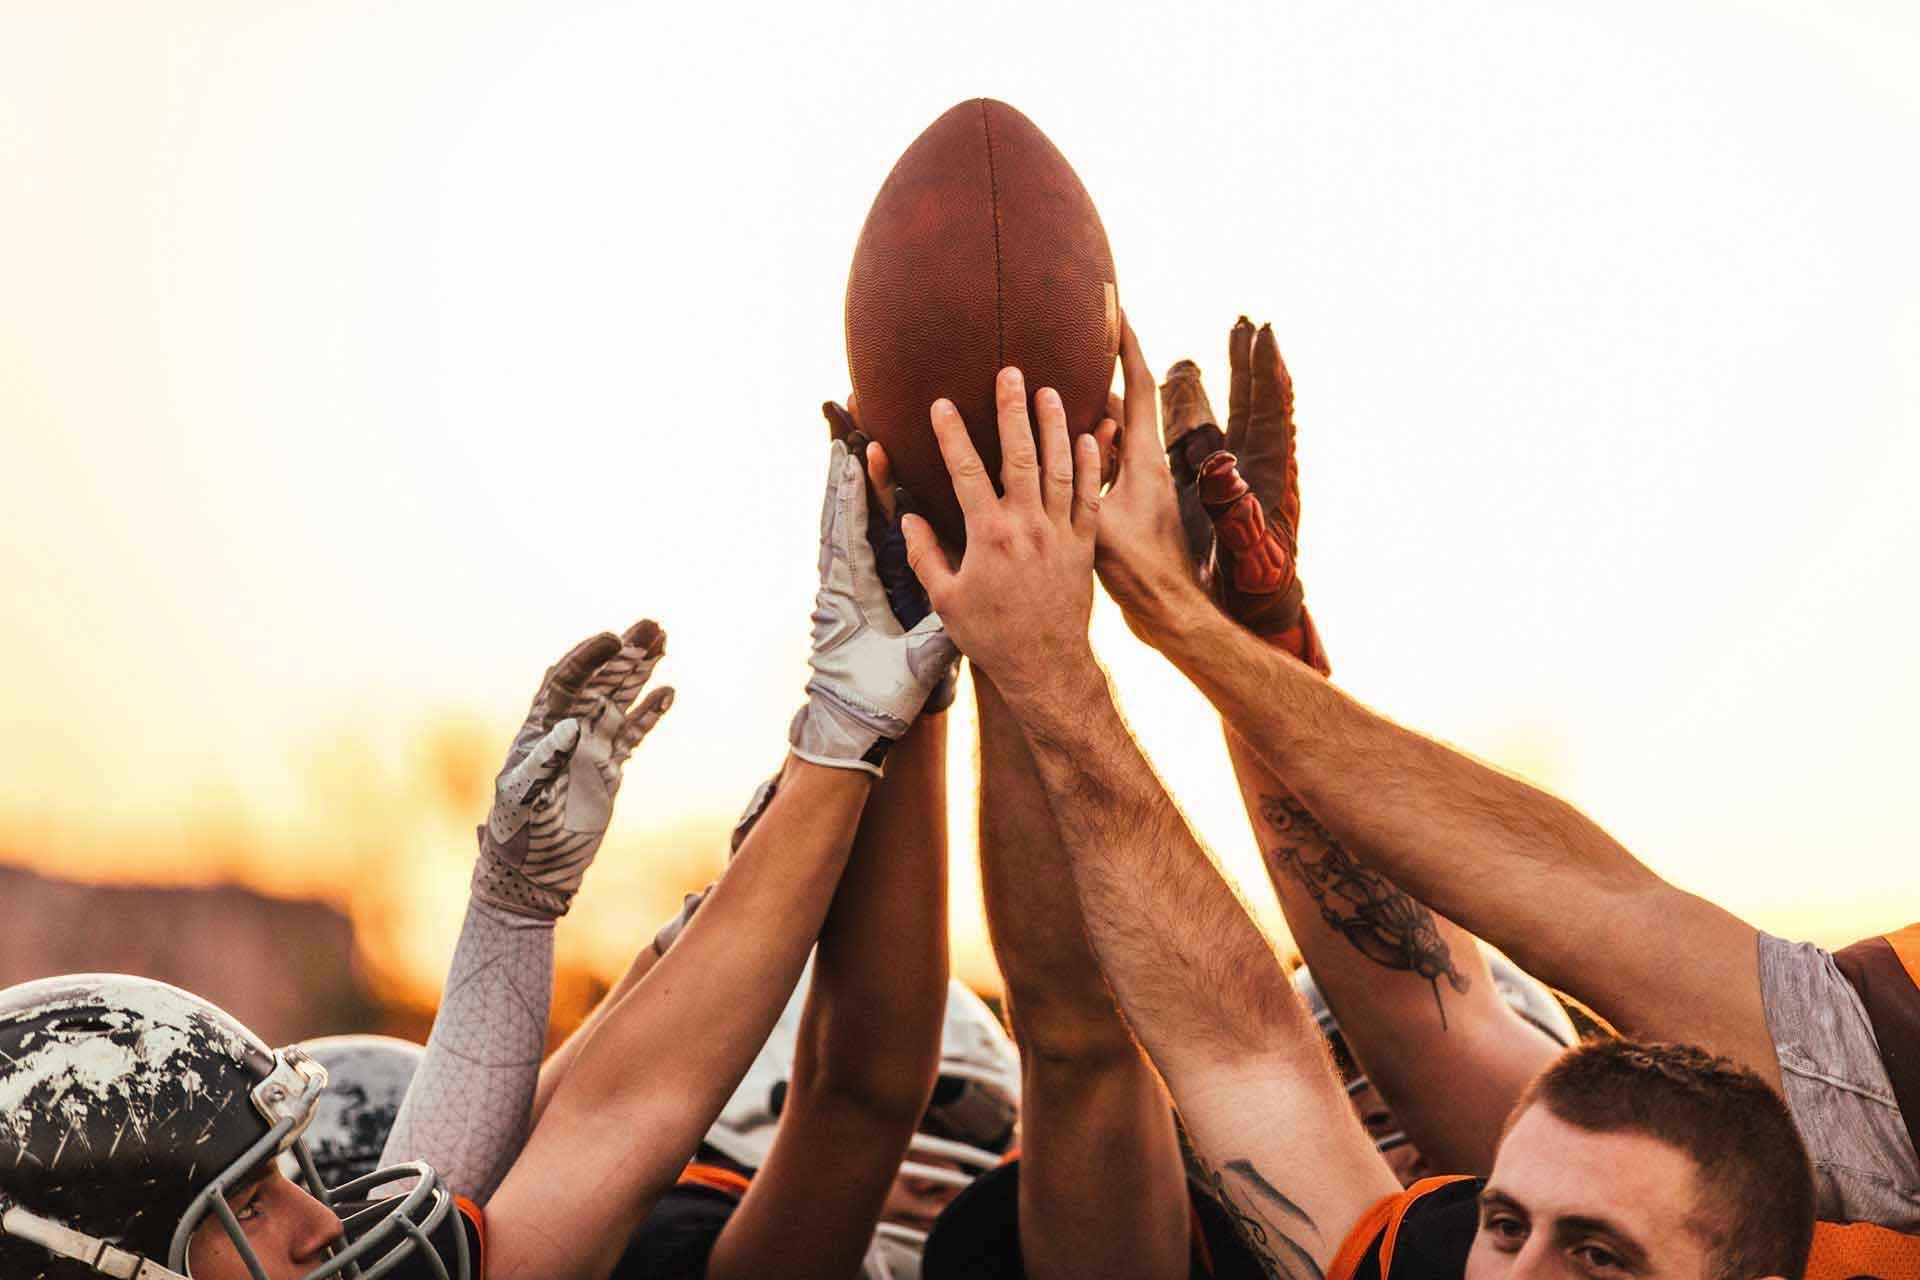 Team motivation ideas from Super Bowl-winning coach Bill Belichick. - blog post image